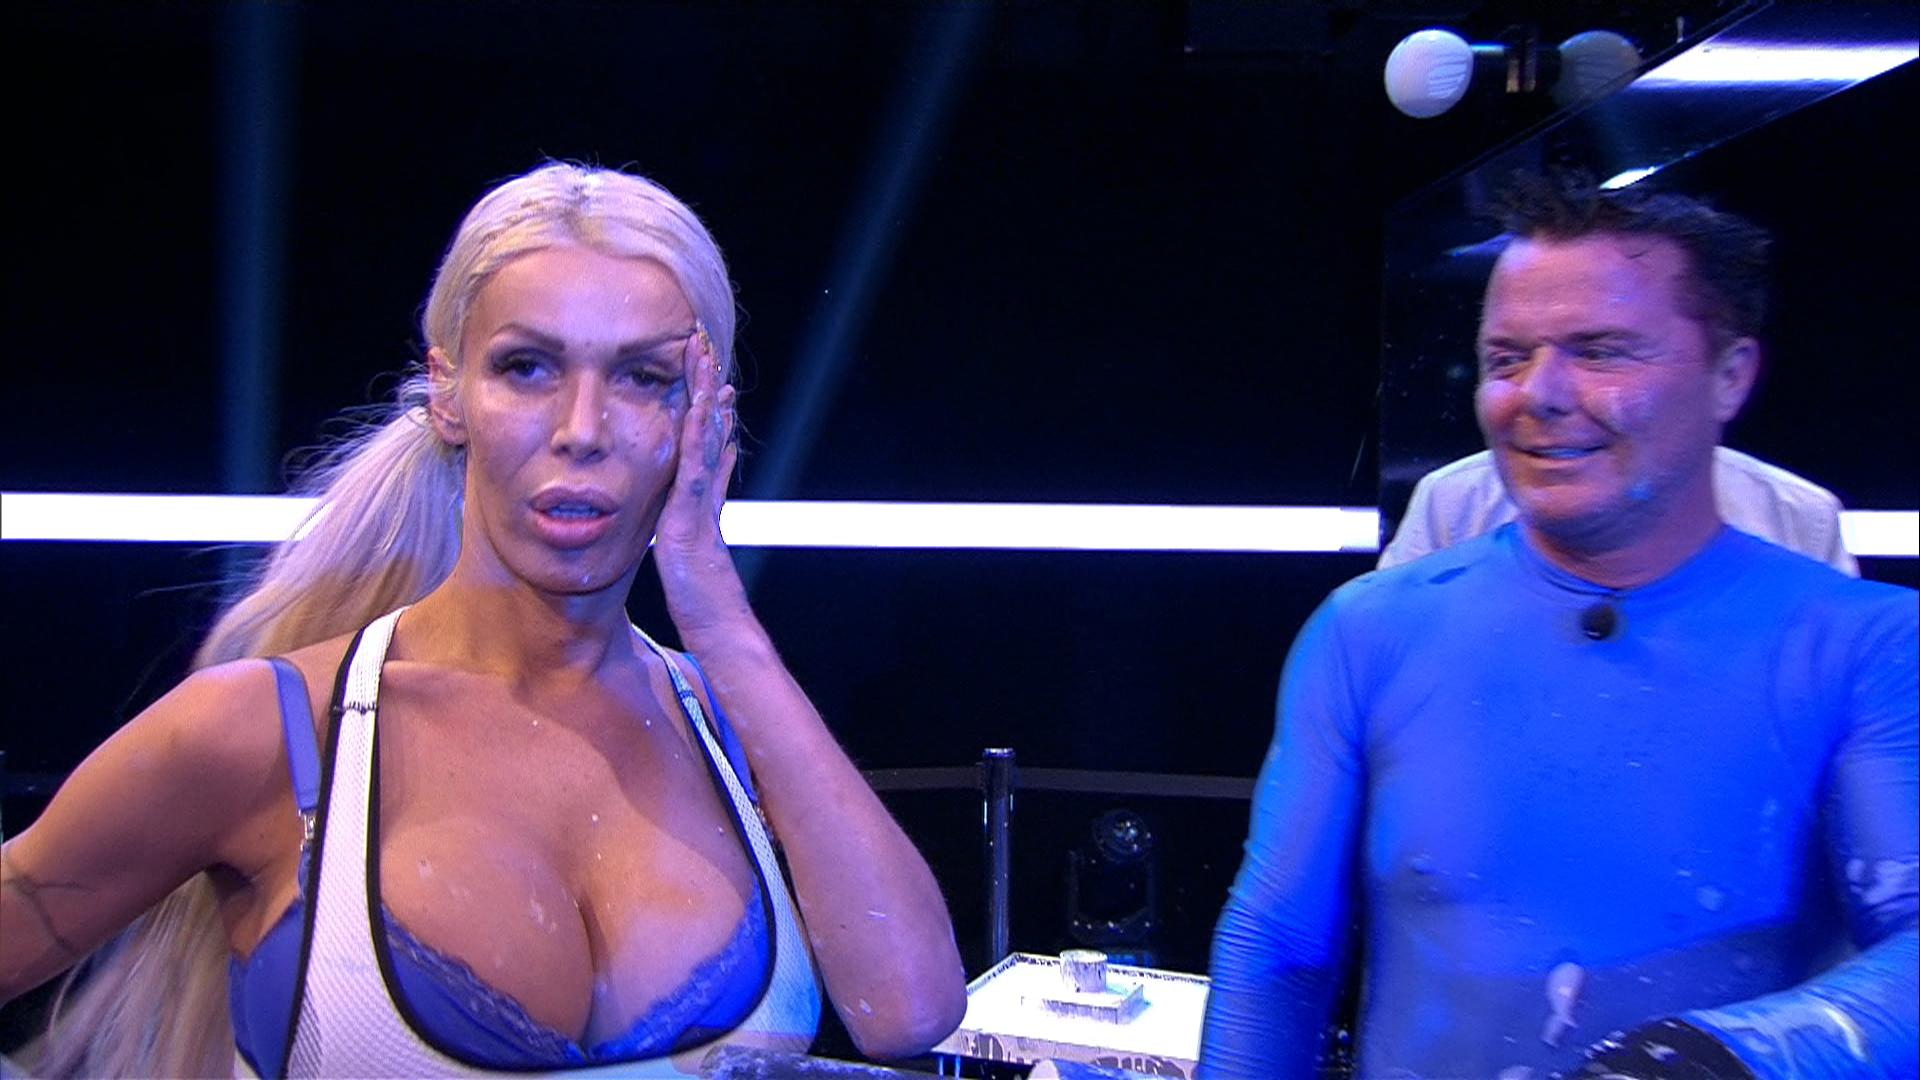 Promi Big Brother 2016 Tag 3 - Edona verletzt sich beim Duell